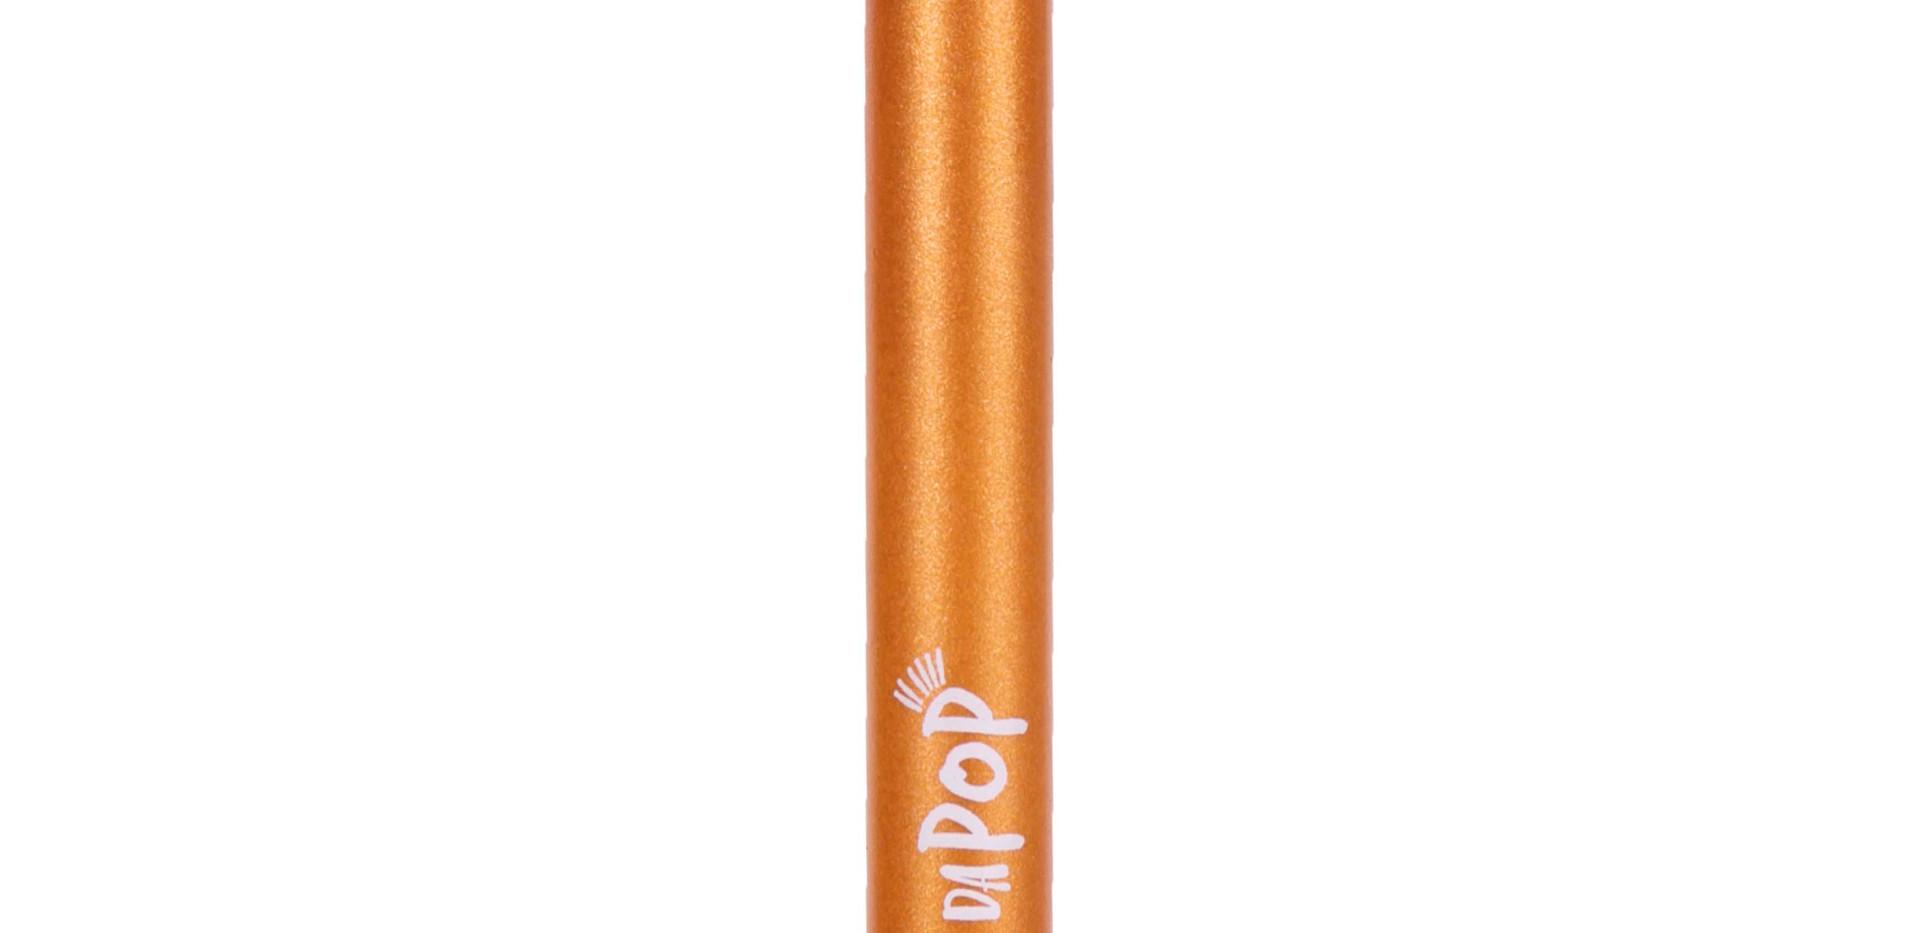 Lápis de Olho Metálico Perfect Eyes Dapop - HB98008 (cor 6)